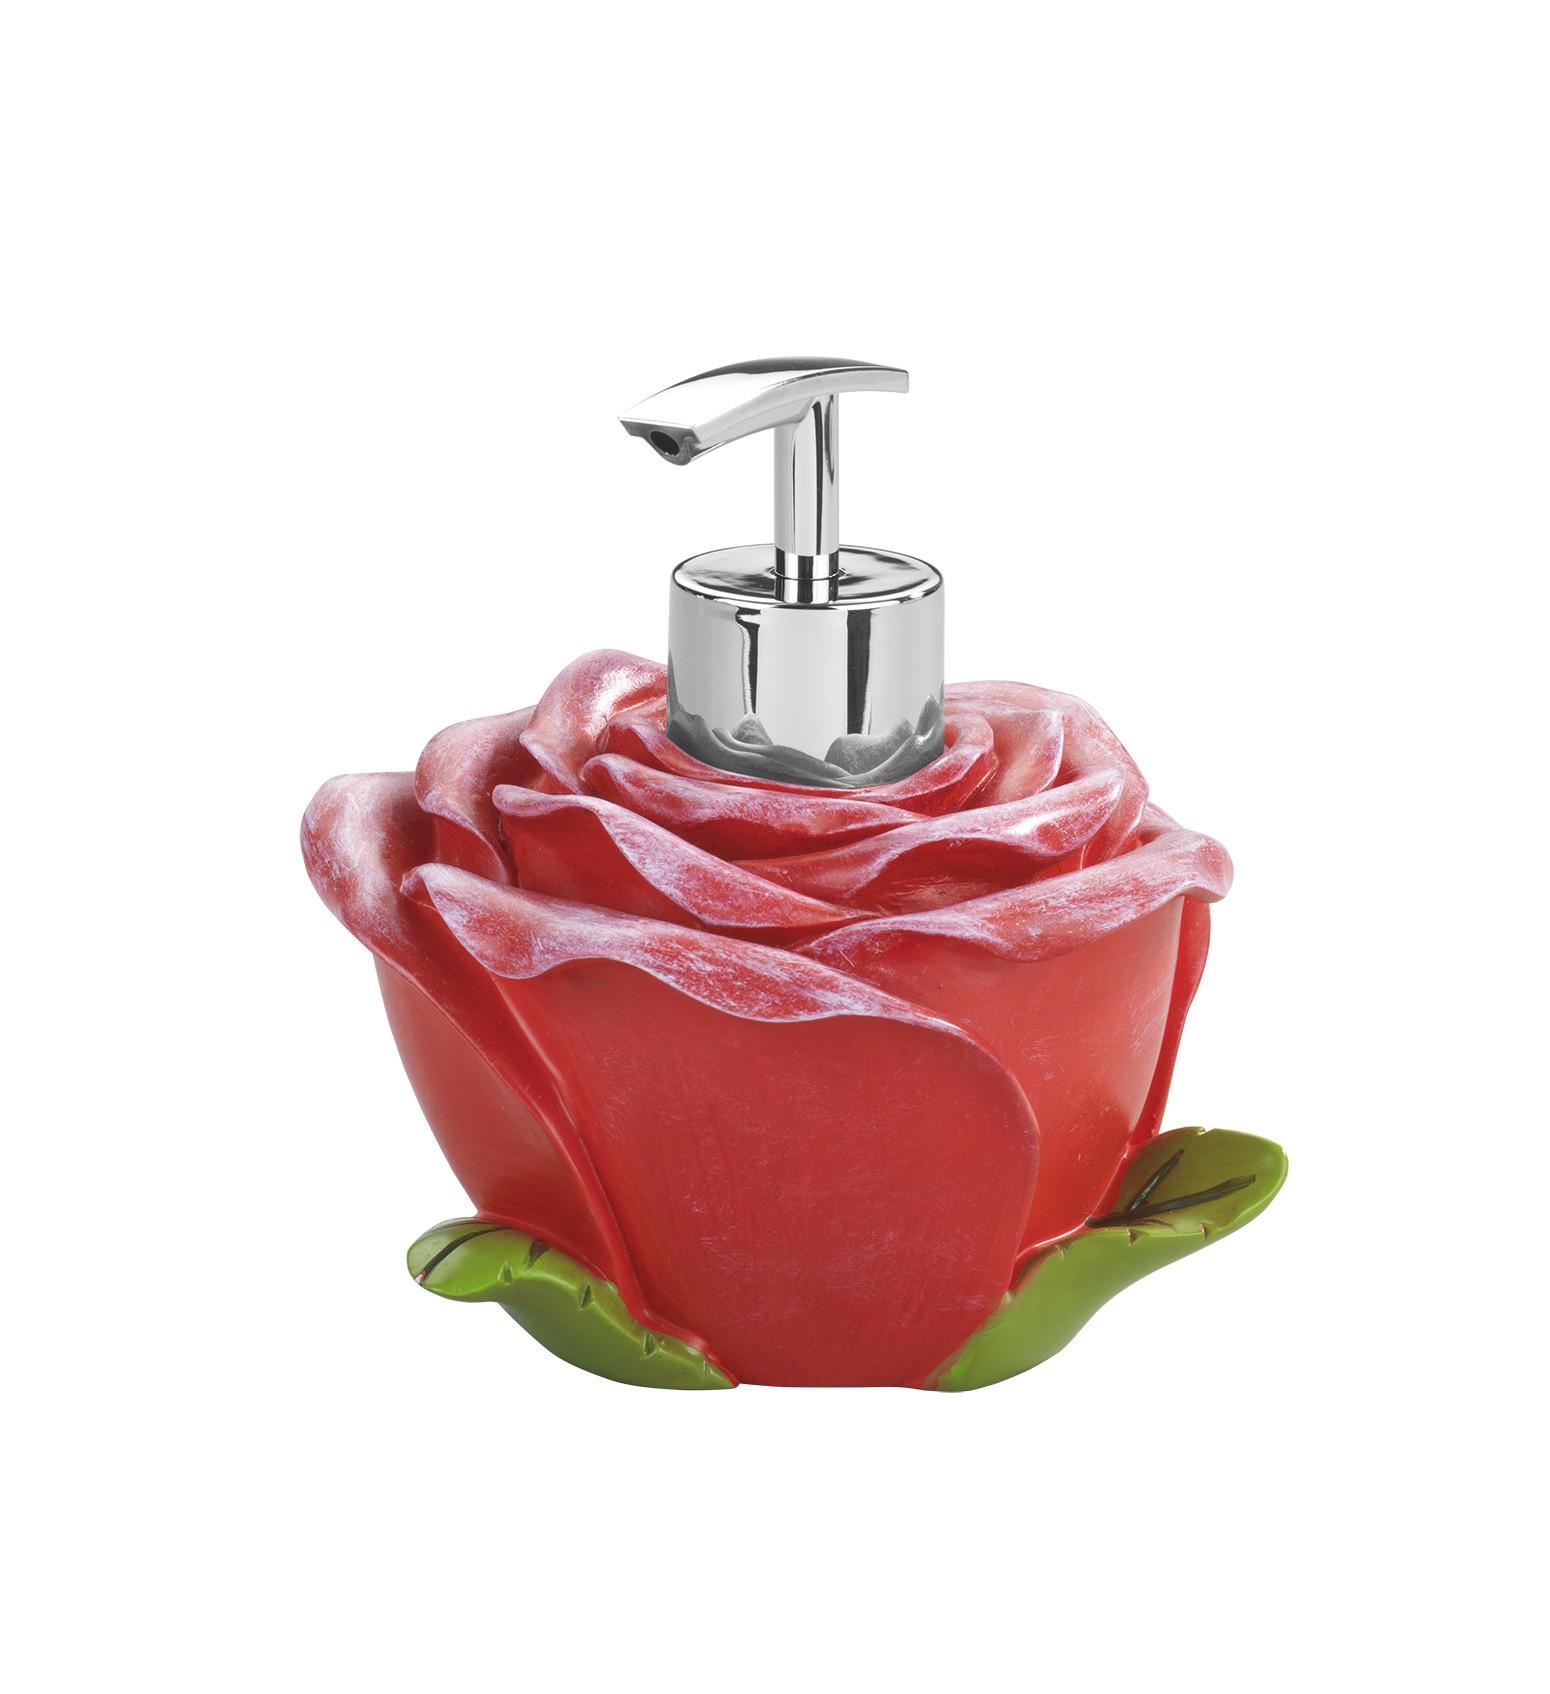 Seifenspender Rose, Spülmittelspender